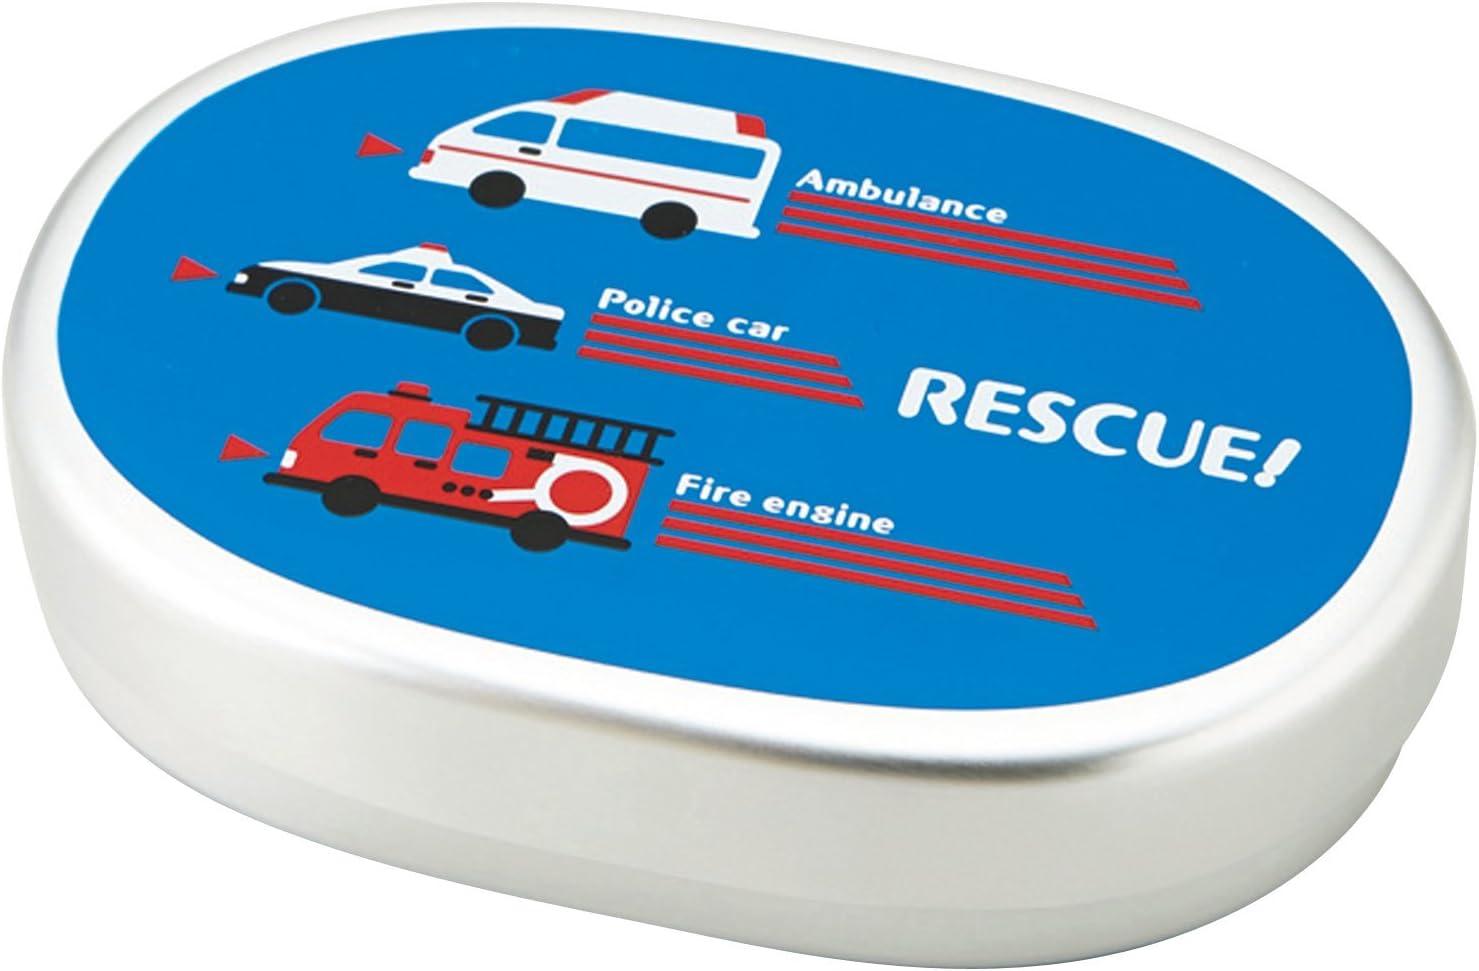 Car sticker ACTIVE DRIVE II Size 14cm x 1.5 cm.